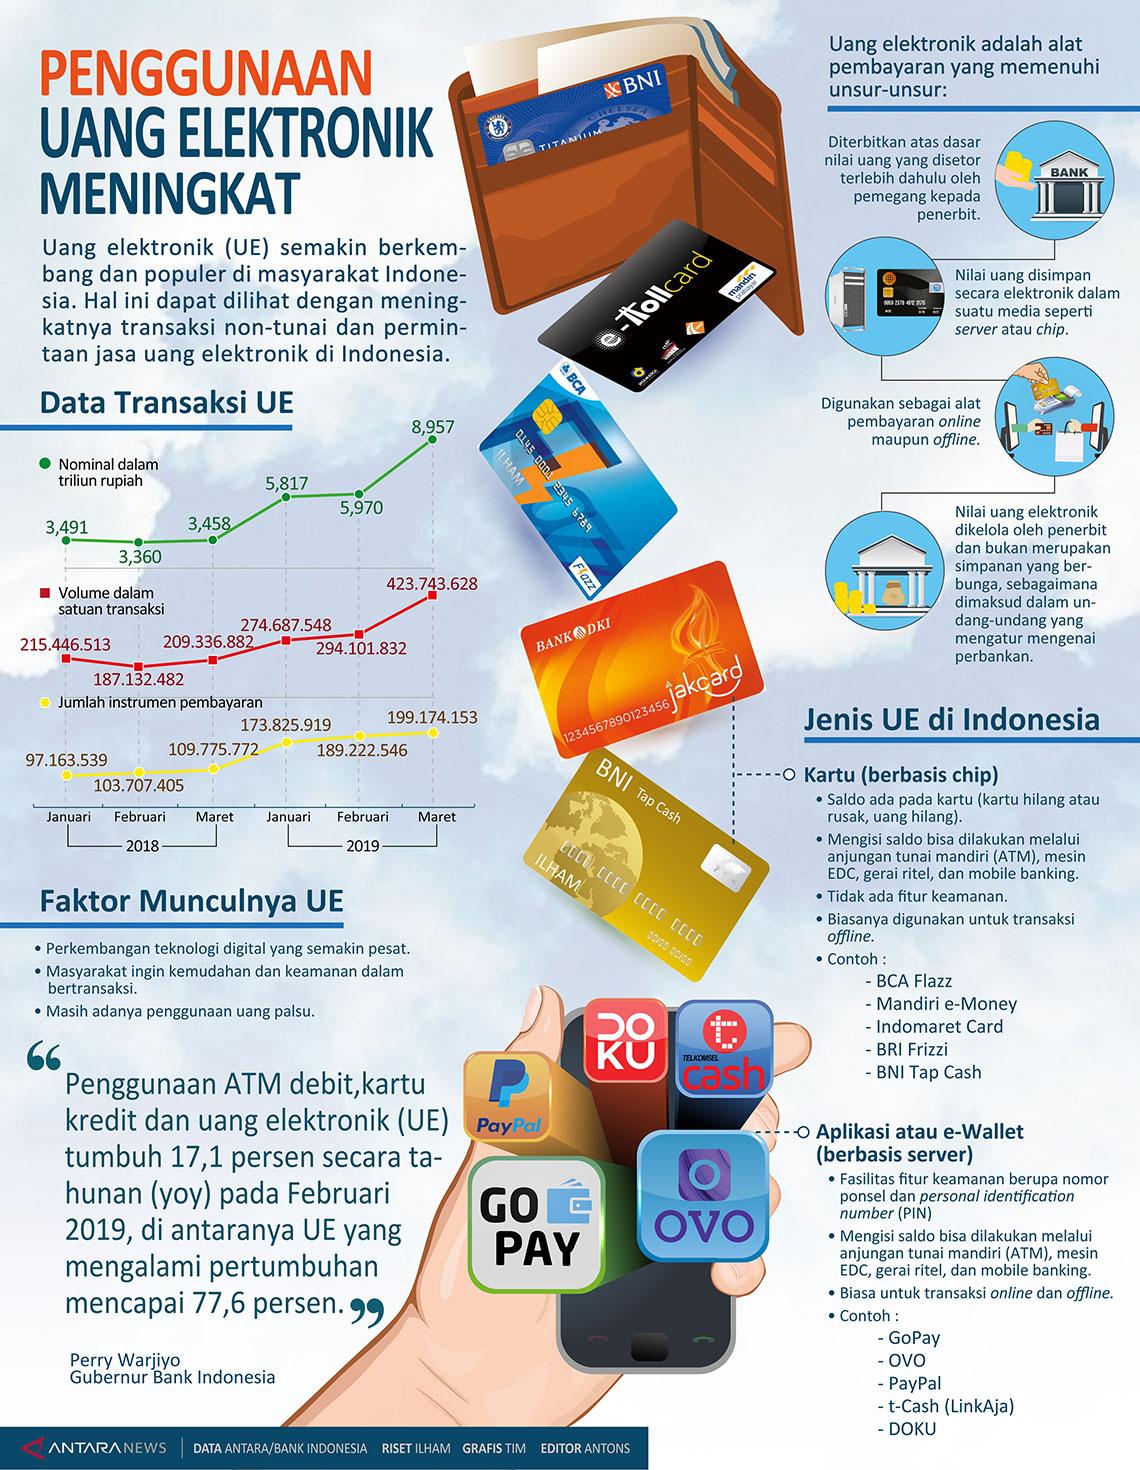 Penggunaan uang elektronik meningkat